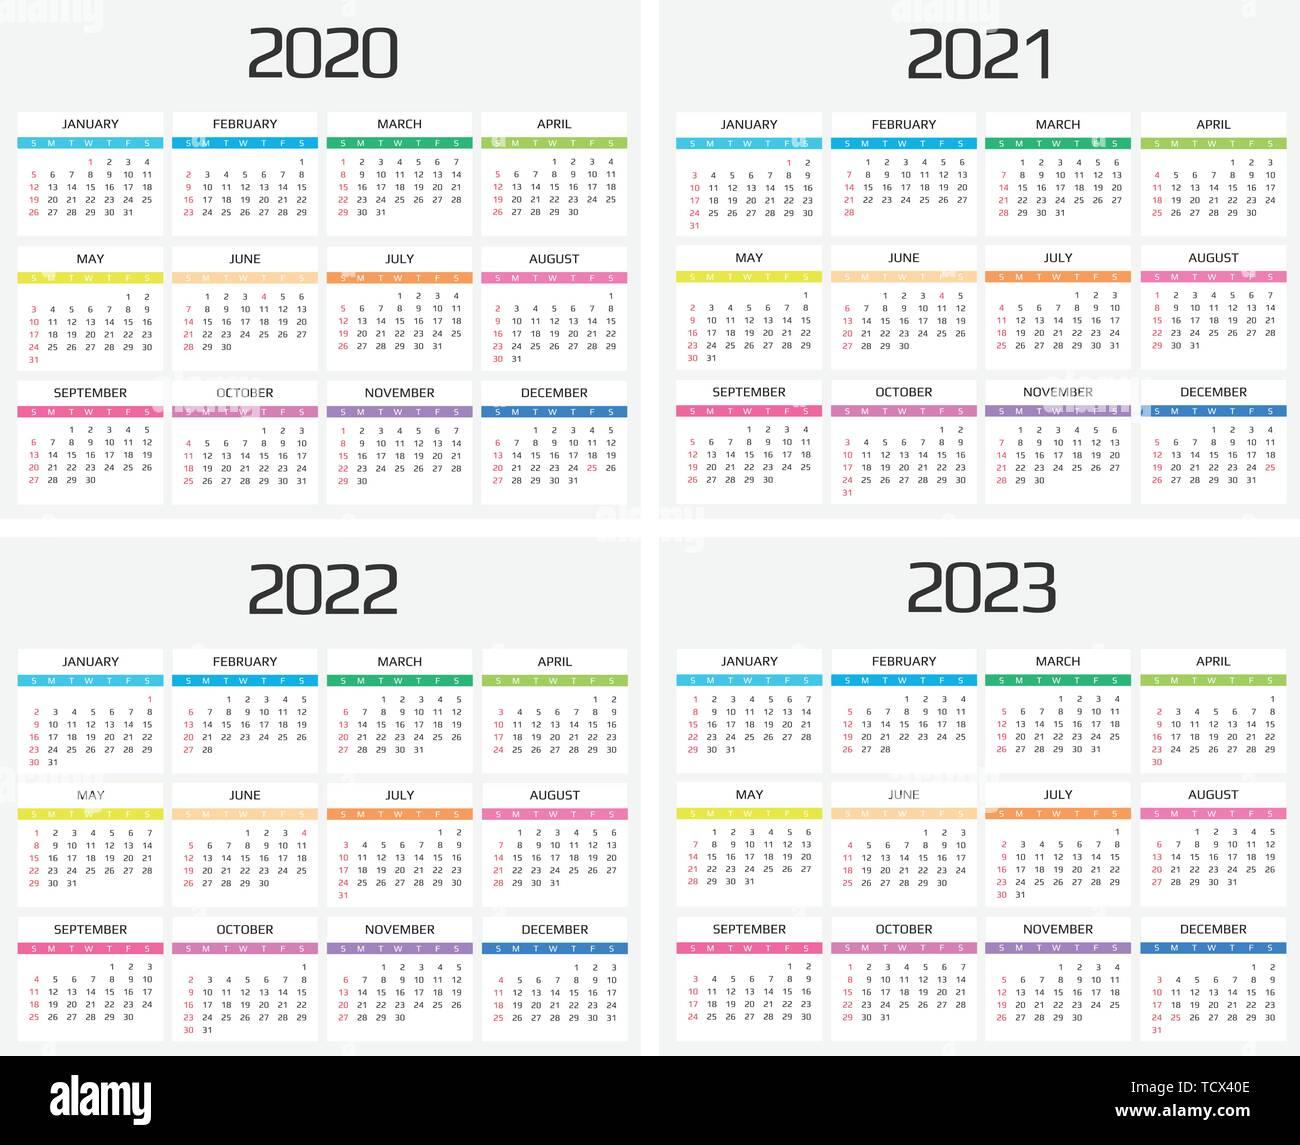 2022 2023 2023 Calendar.Calendar 2020 2021 2022 2023 Template 12 Months Include Holiday Event Week Starts Sunday Stock Vector Image Art Alamy